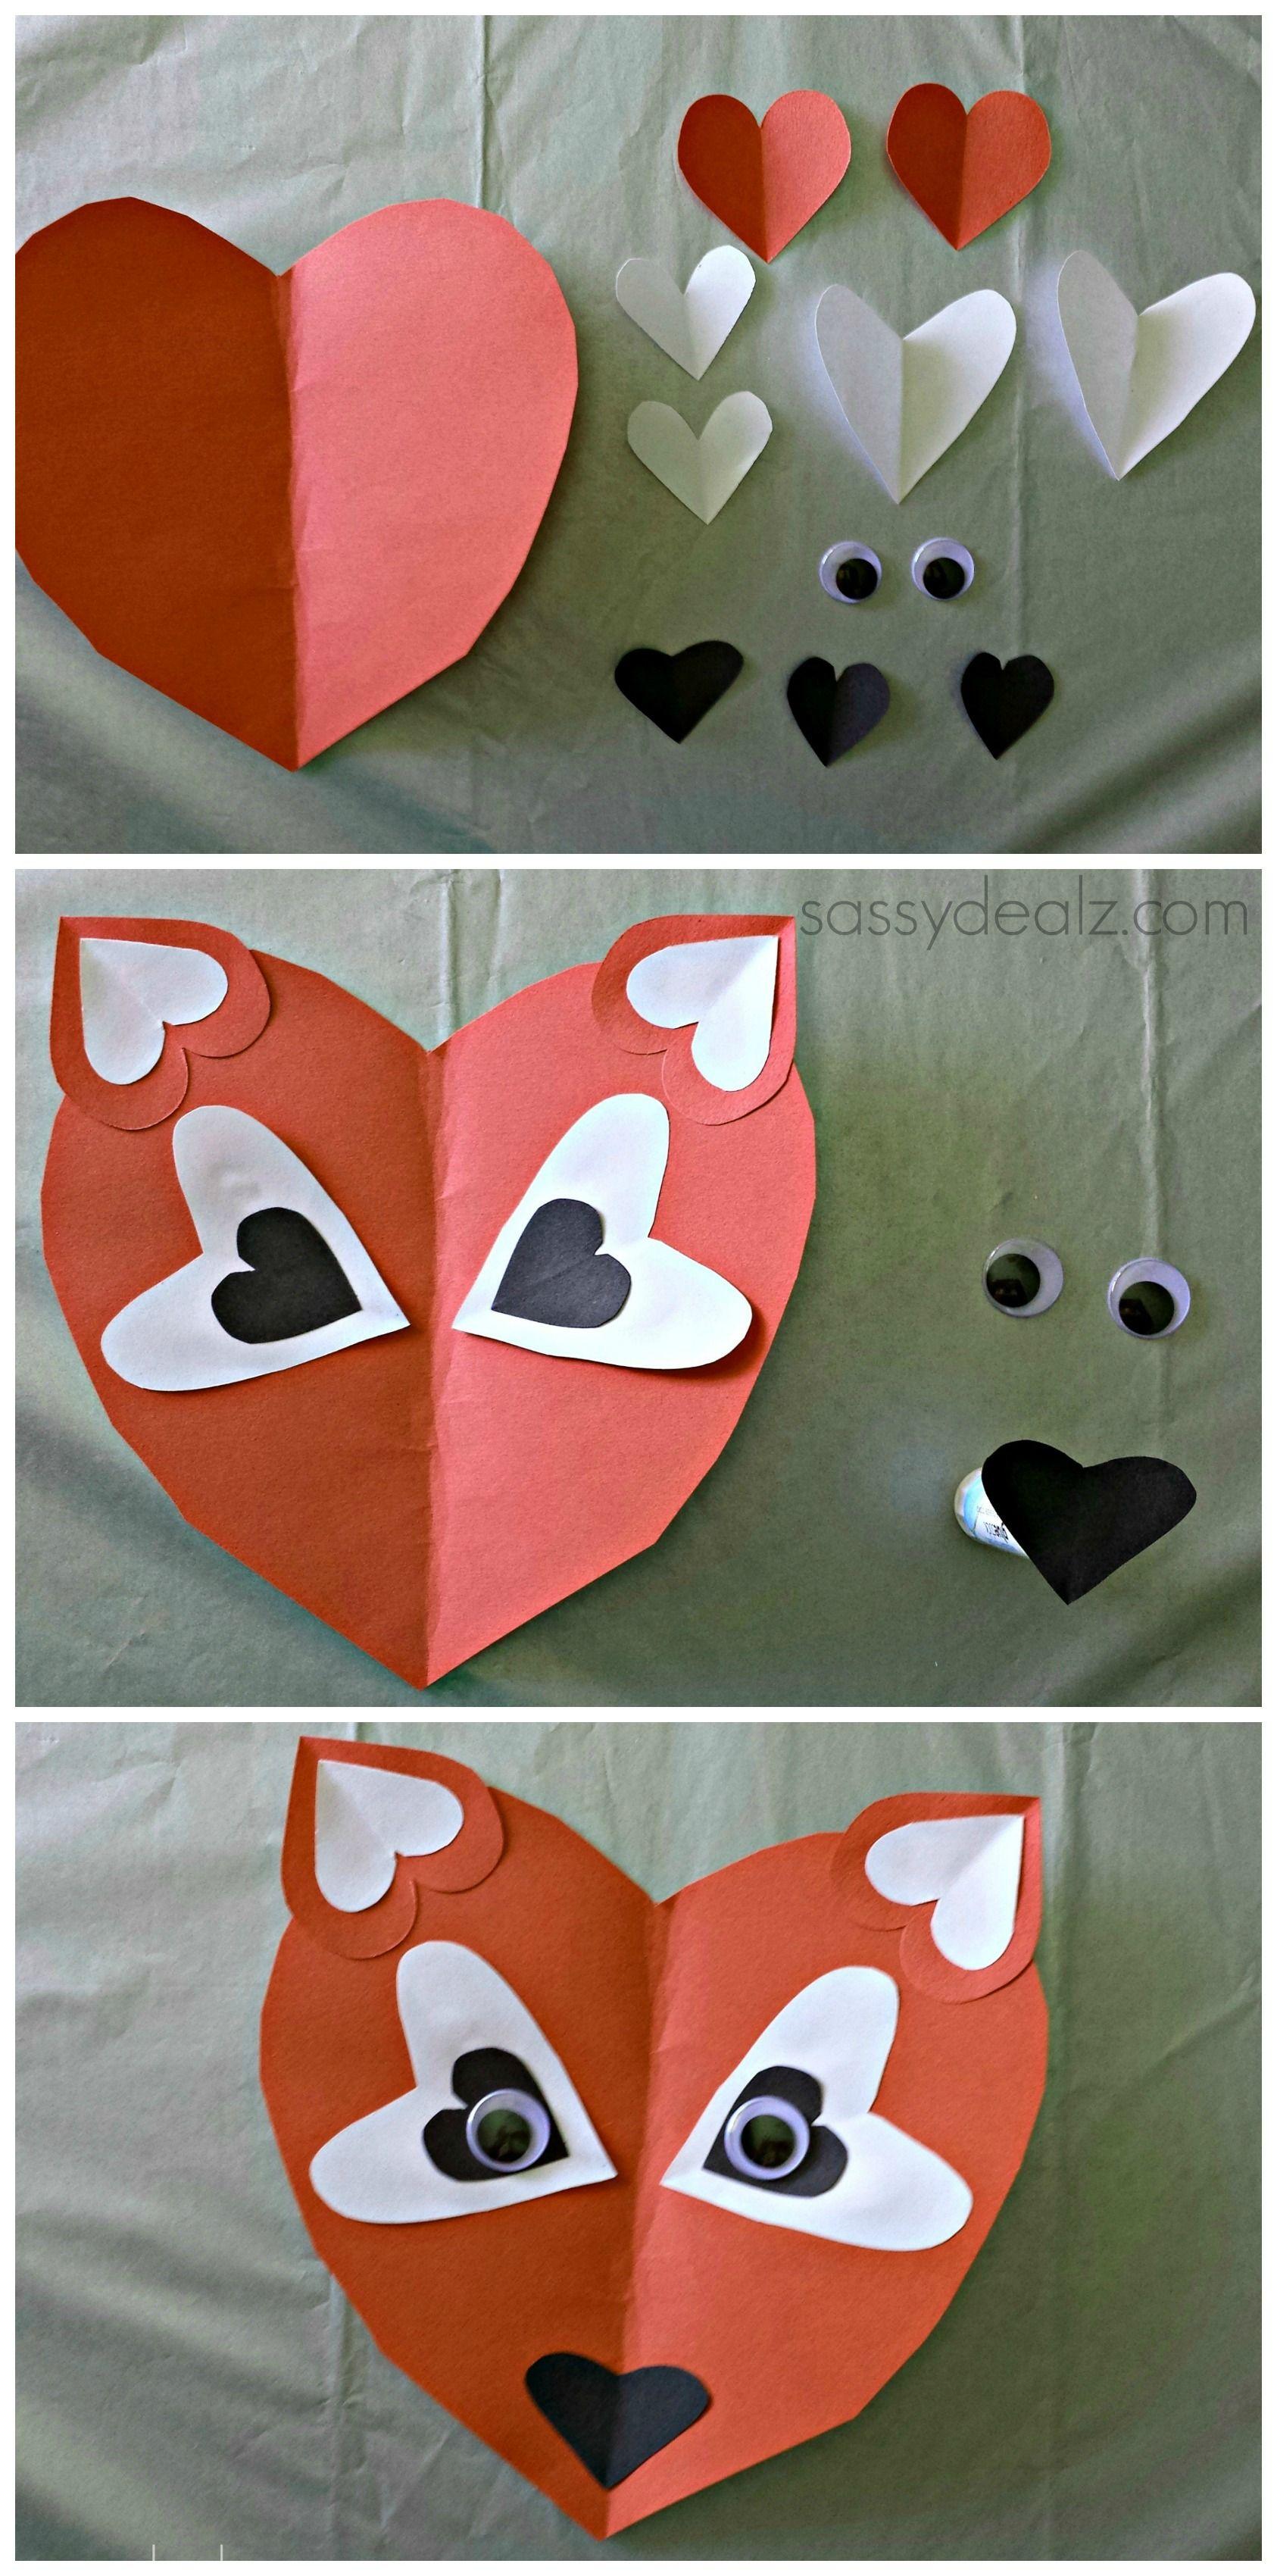 Valentine crafts for kindergarteners - Paper Heart Fox Craft For Kids